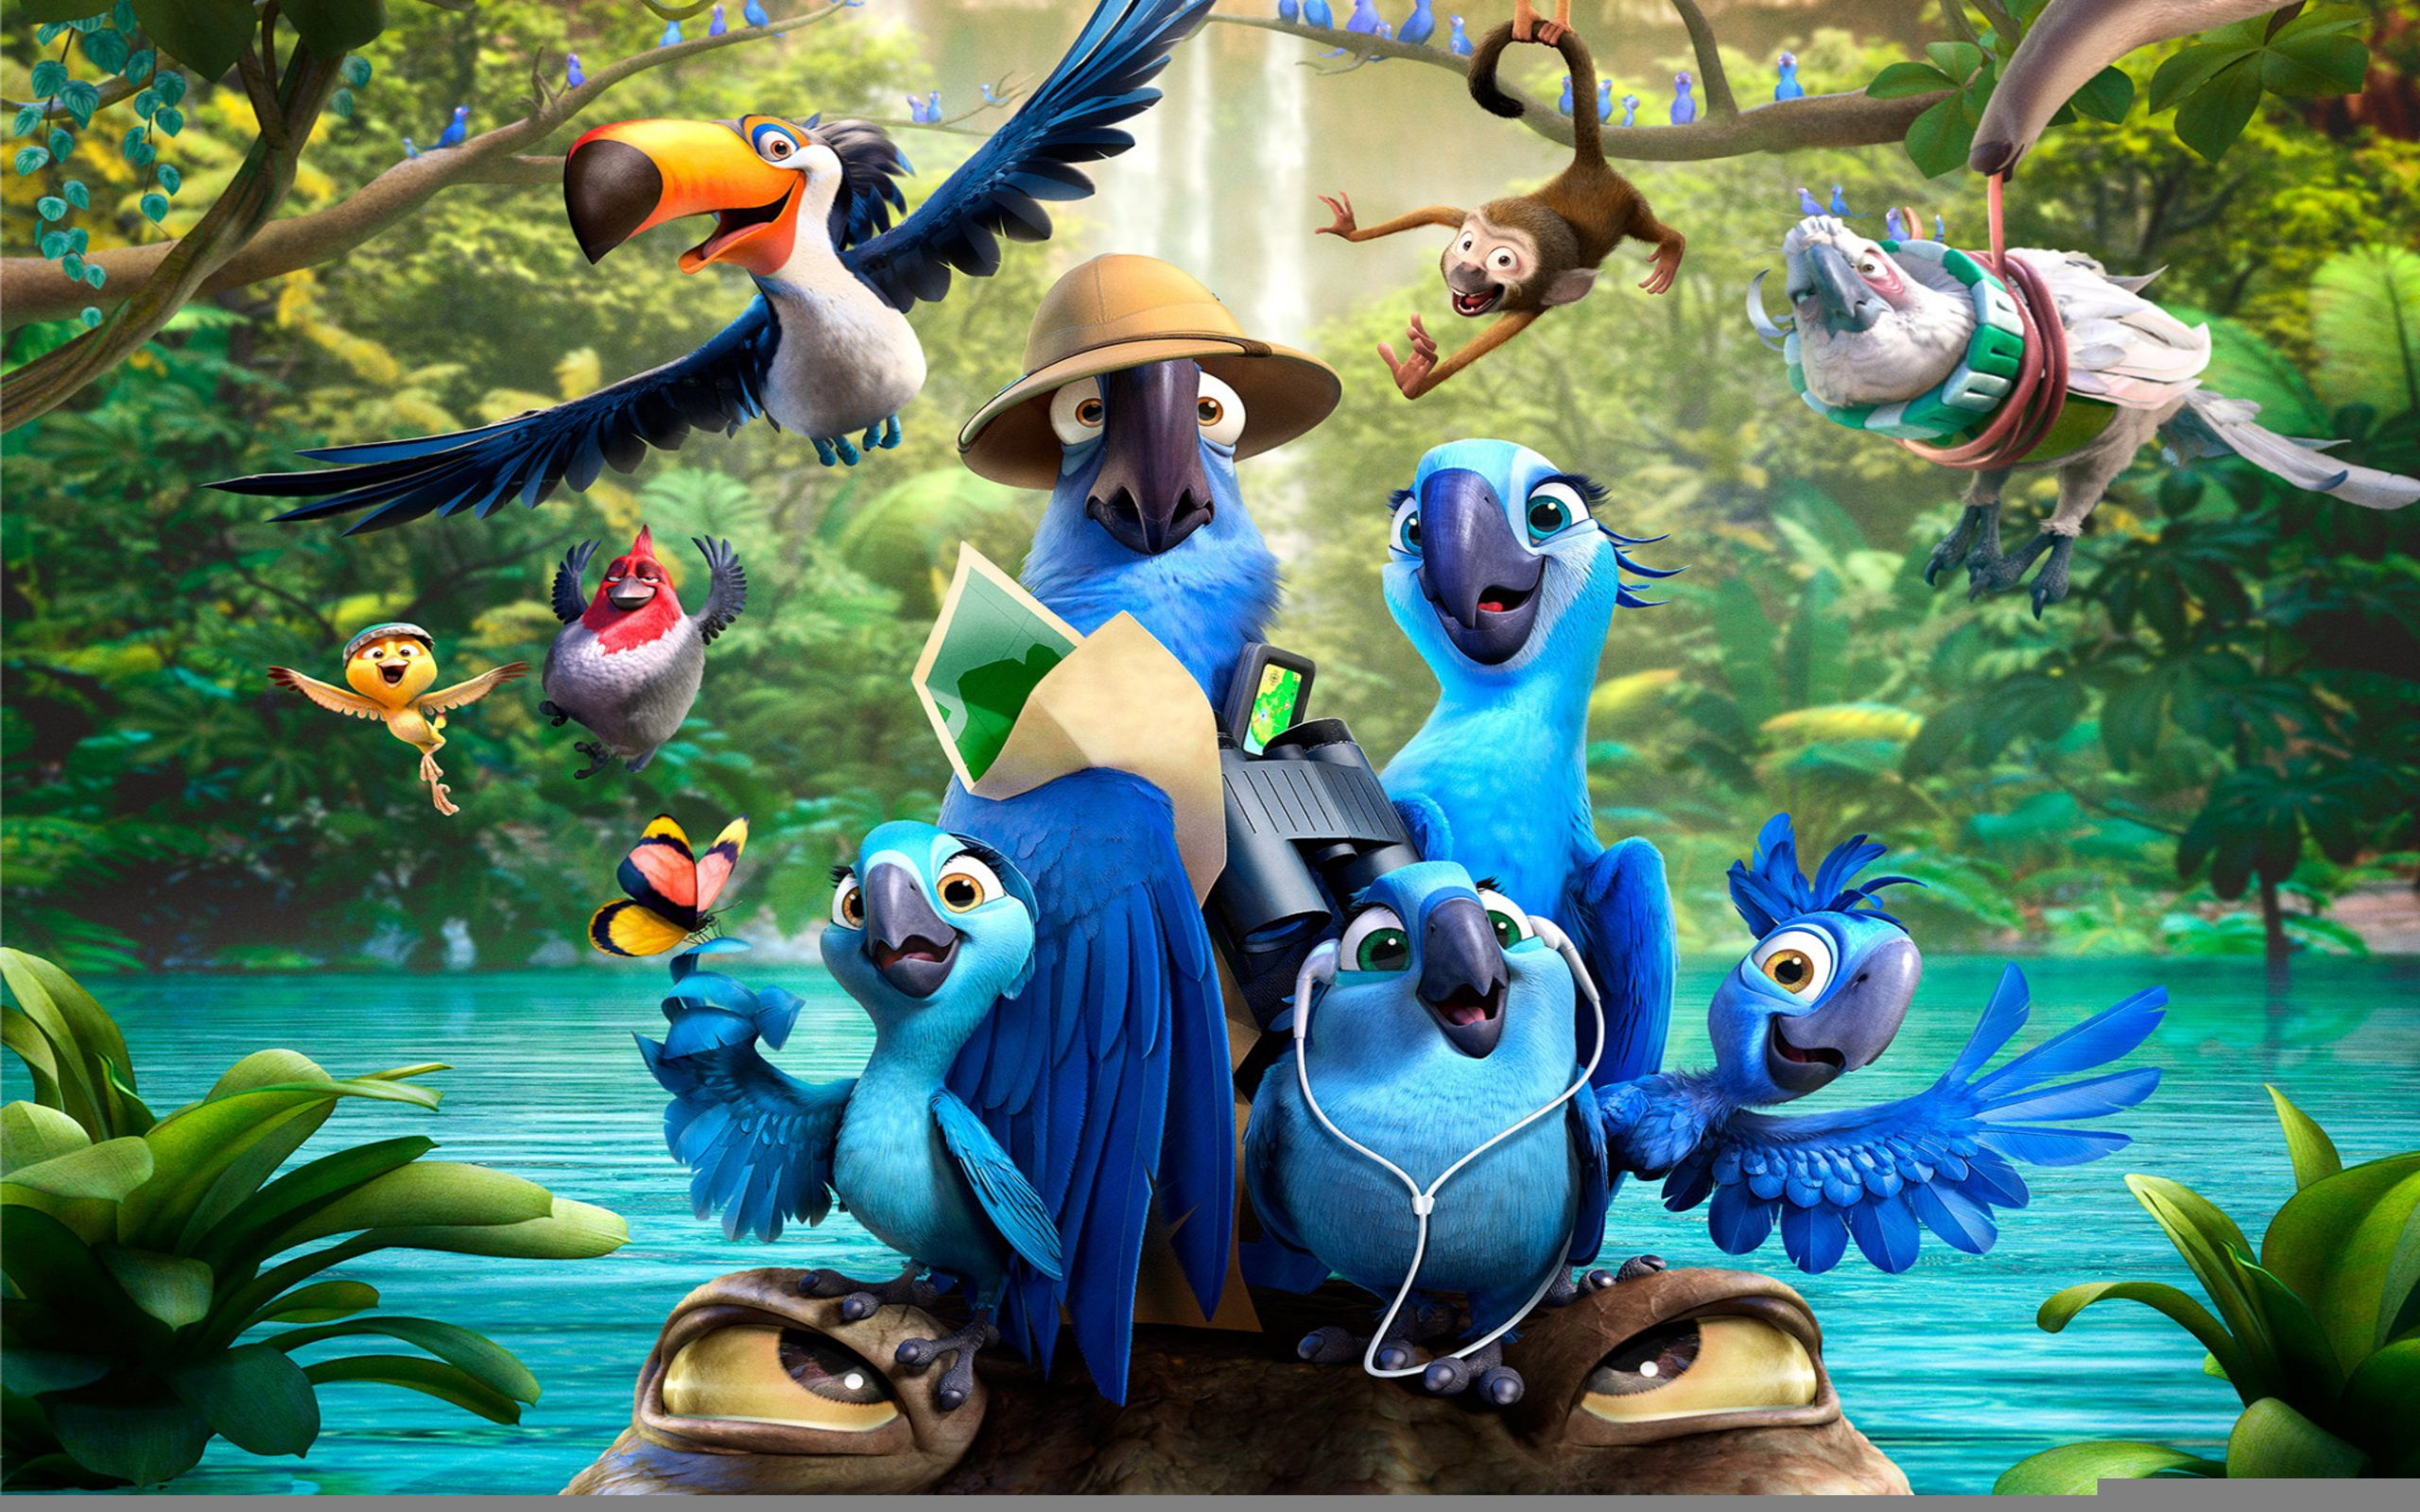 Creature 3d Movie Wallpaper Download Rio 2 Cartoon Hd Wallpapers Pulse